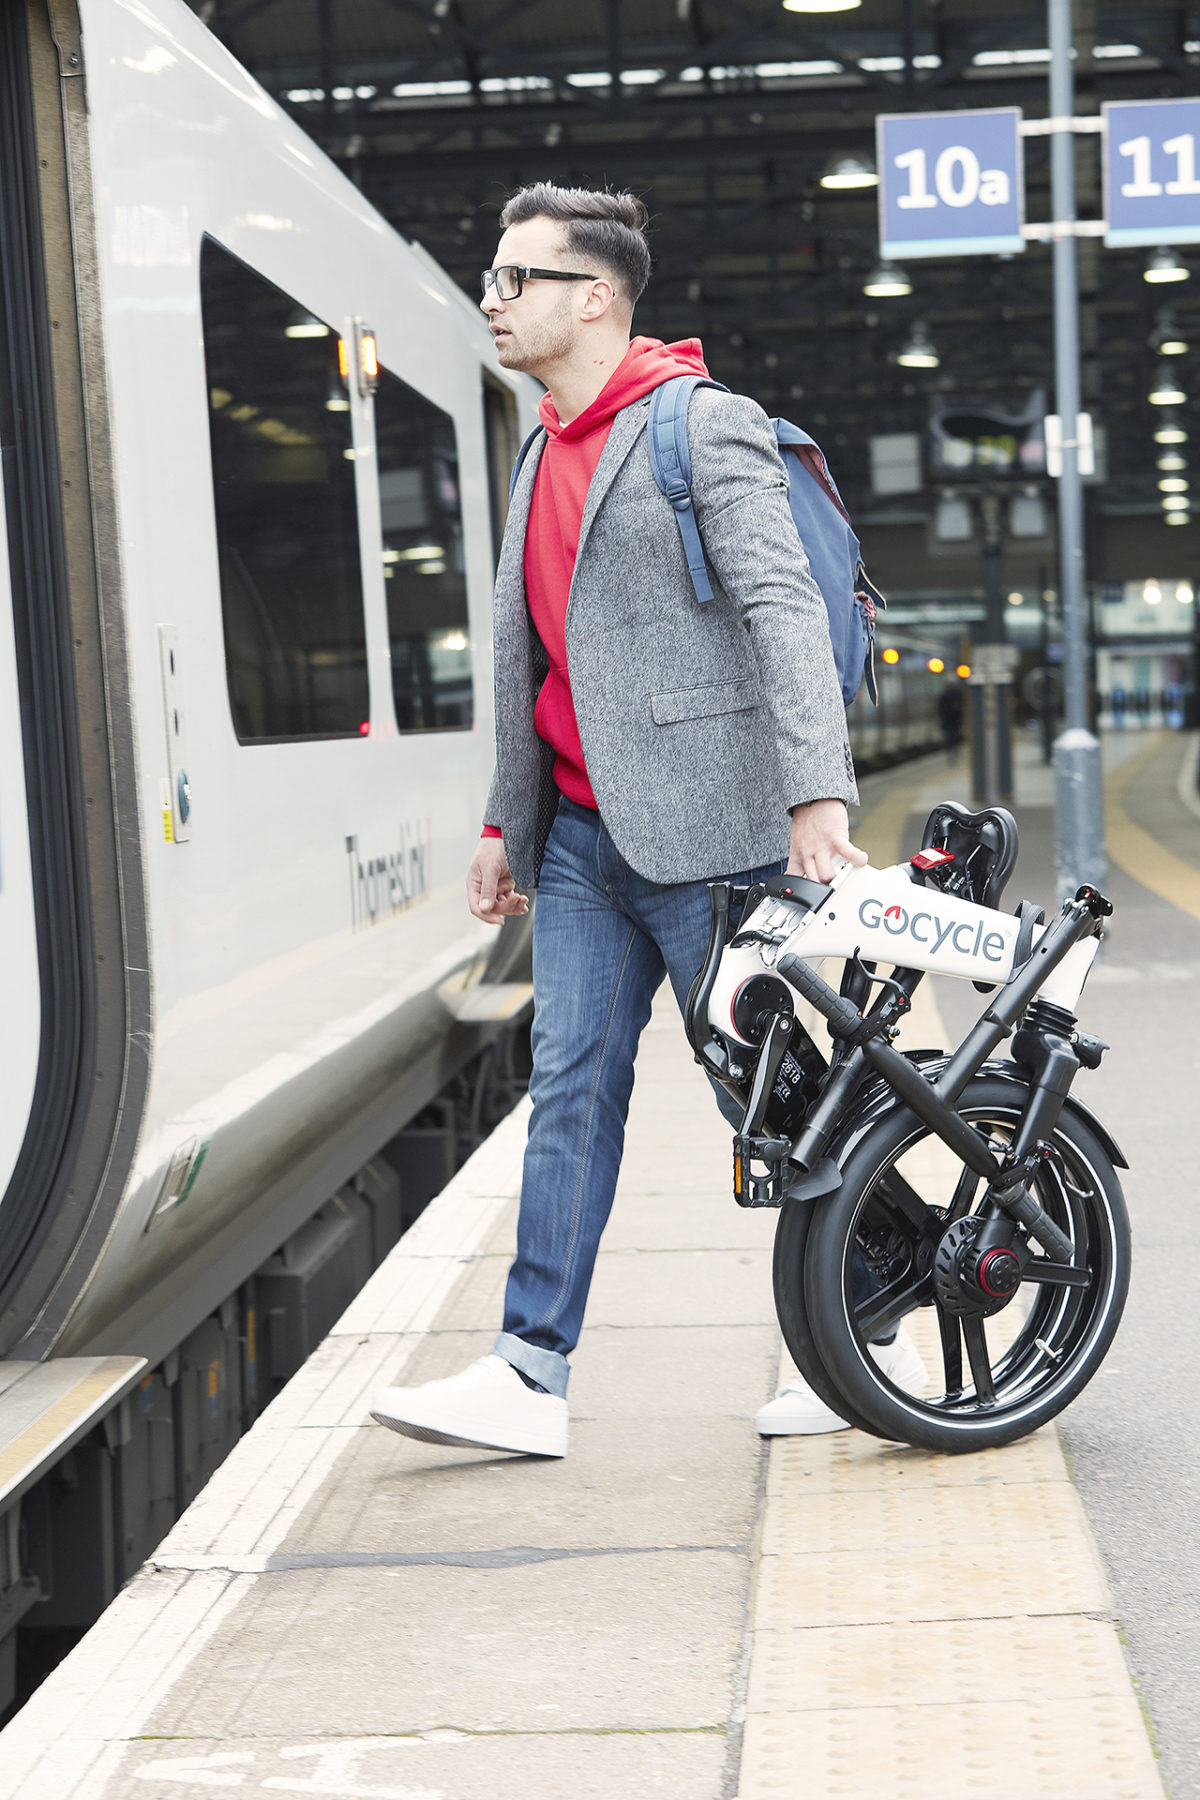 Gocycle GX - Transport